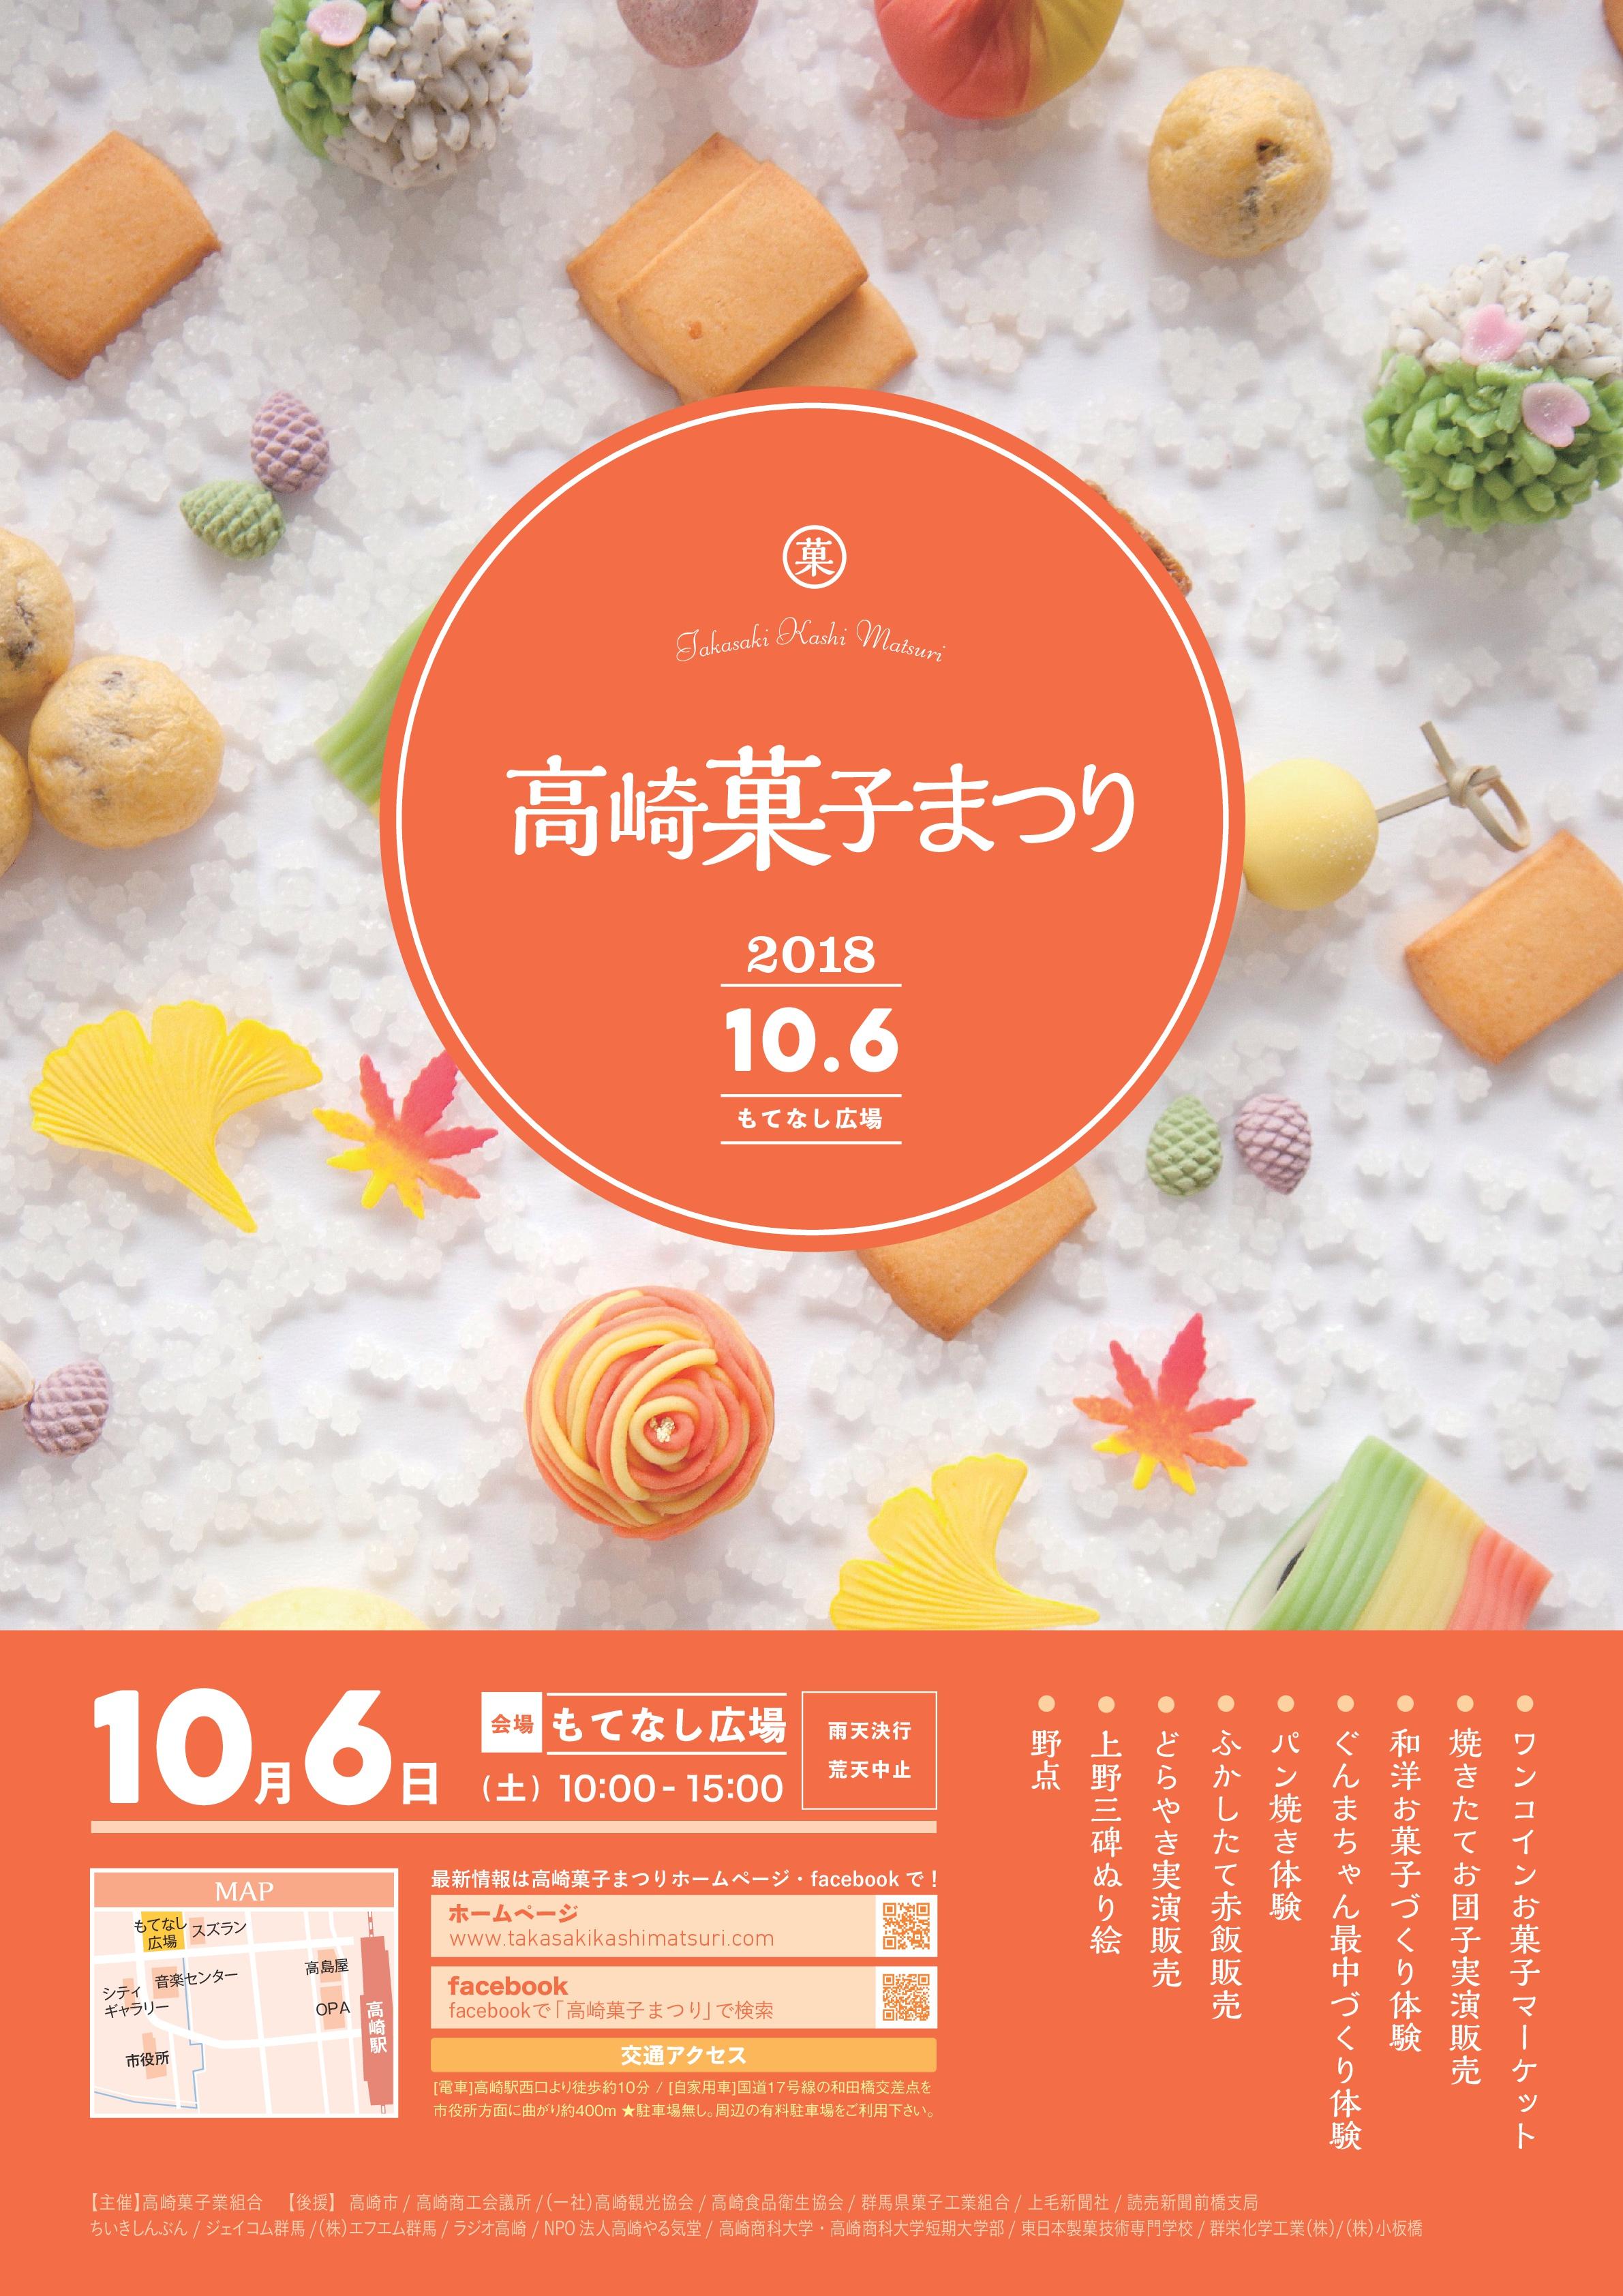 kashimatsuri_poster_2018-001